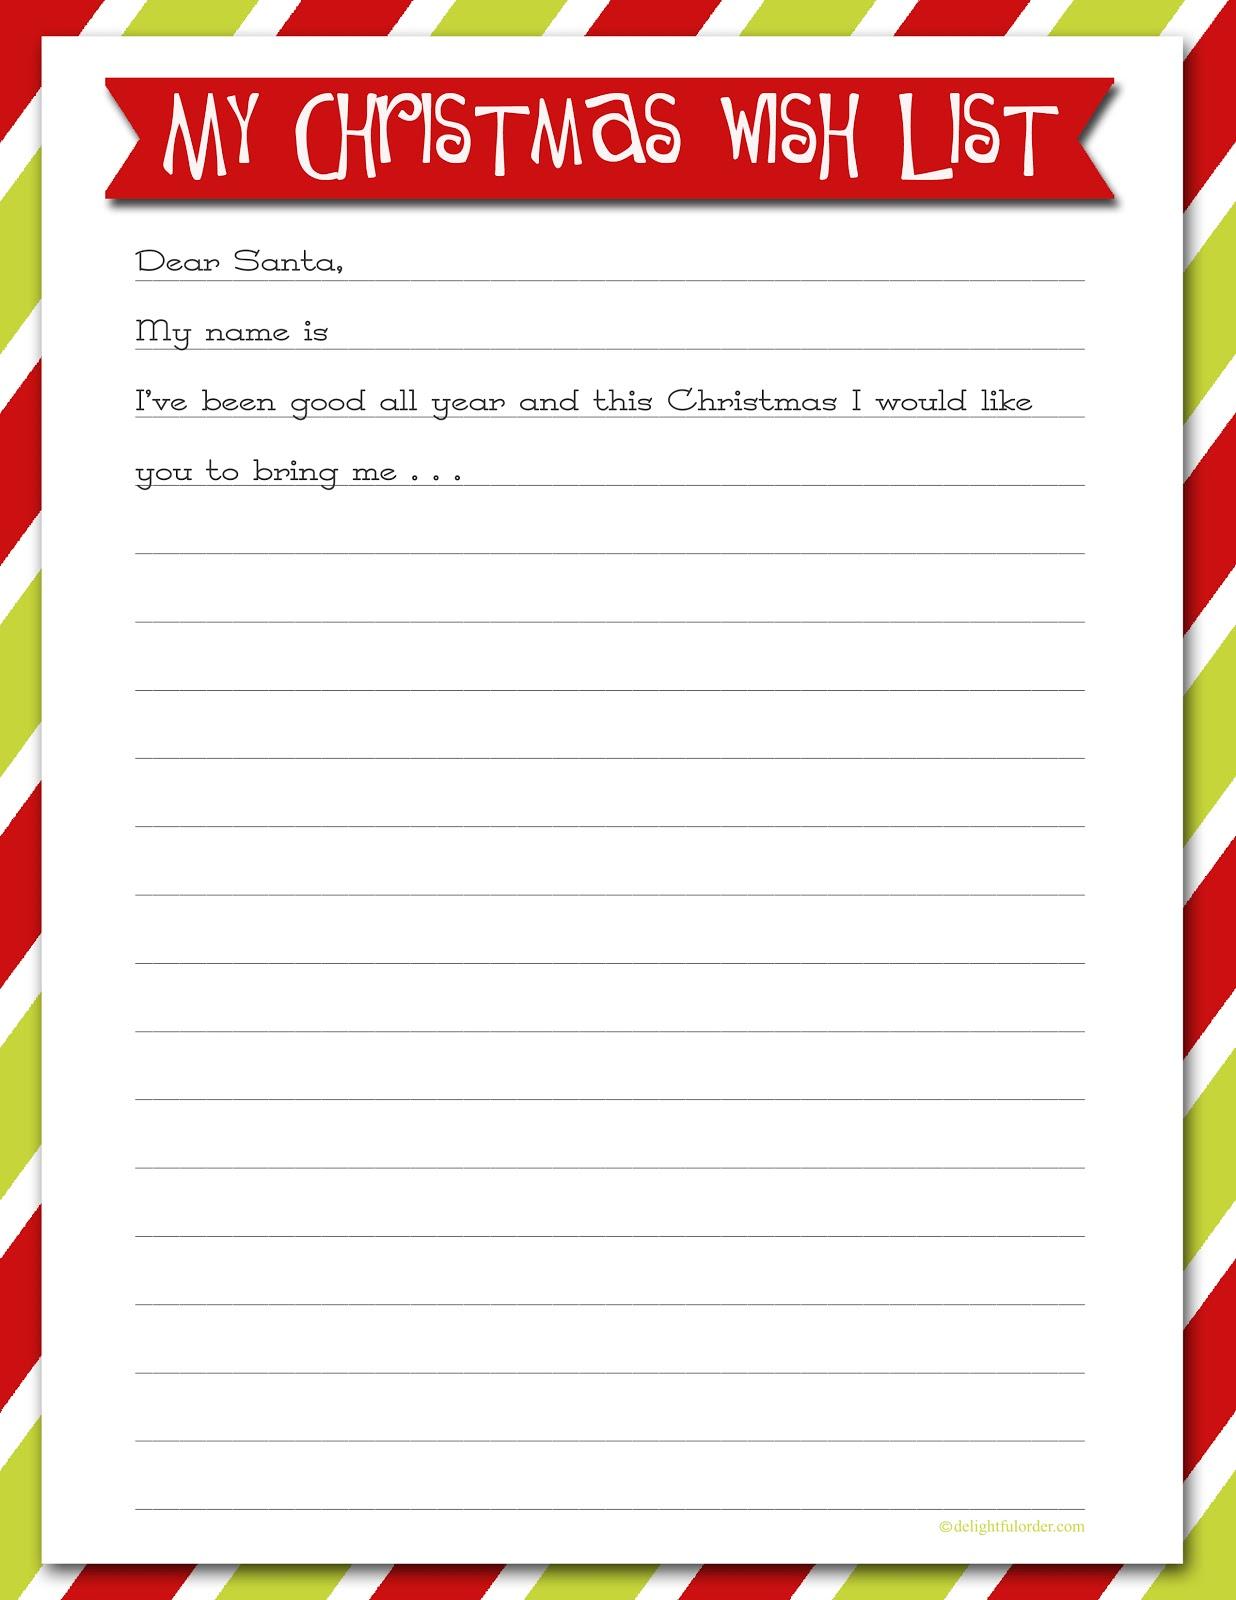 Santa wish list clipart png royalty free download Free christmas wish list clipart - ClipartFox png royalty free download